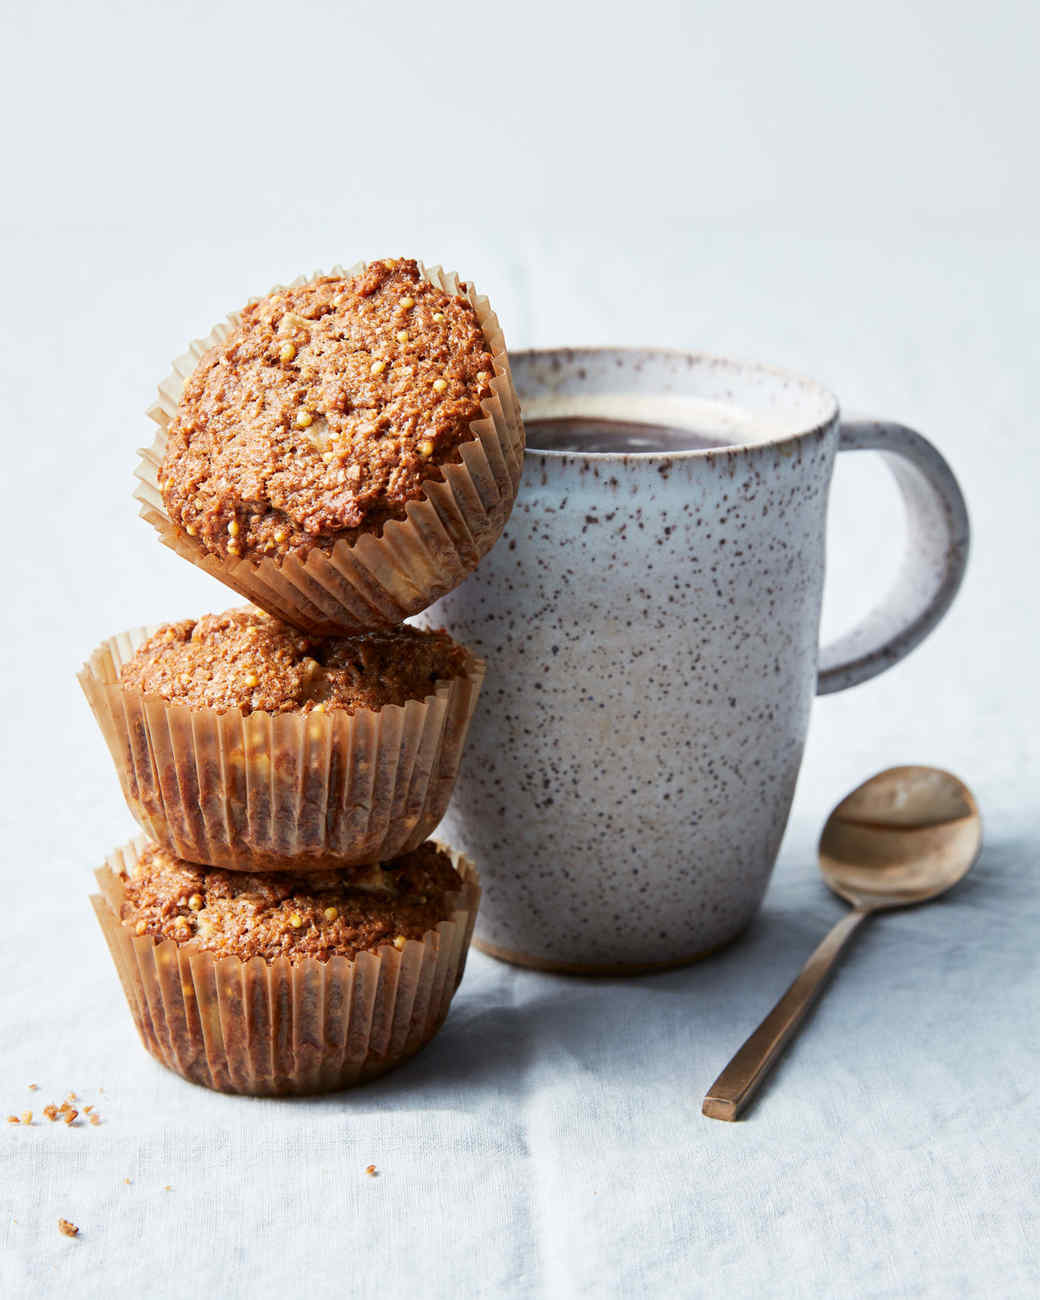 apple-bran-muffin-437-d113047-1.jpg